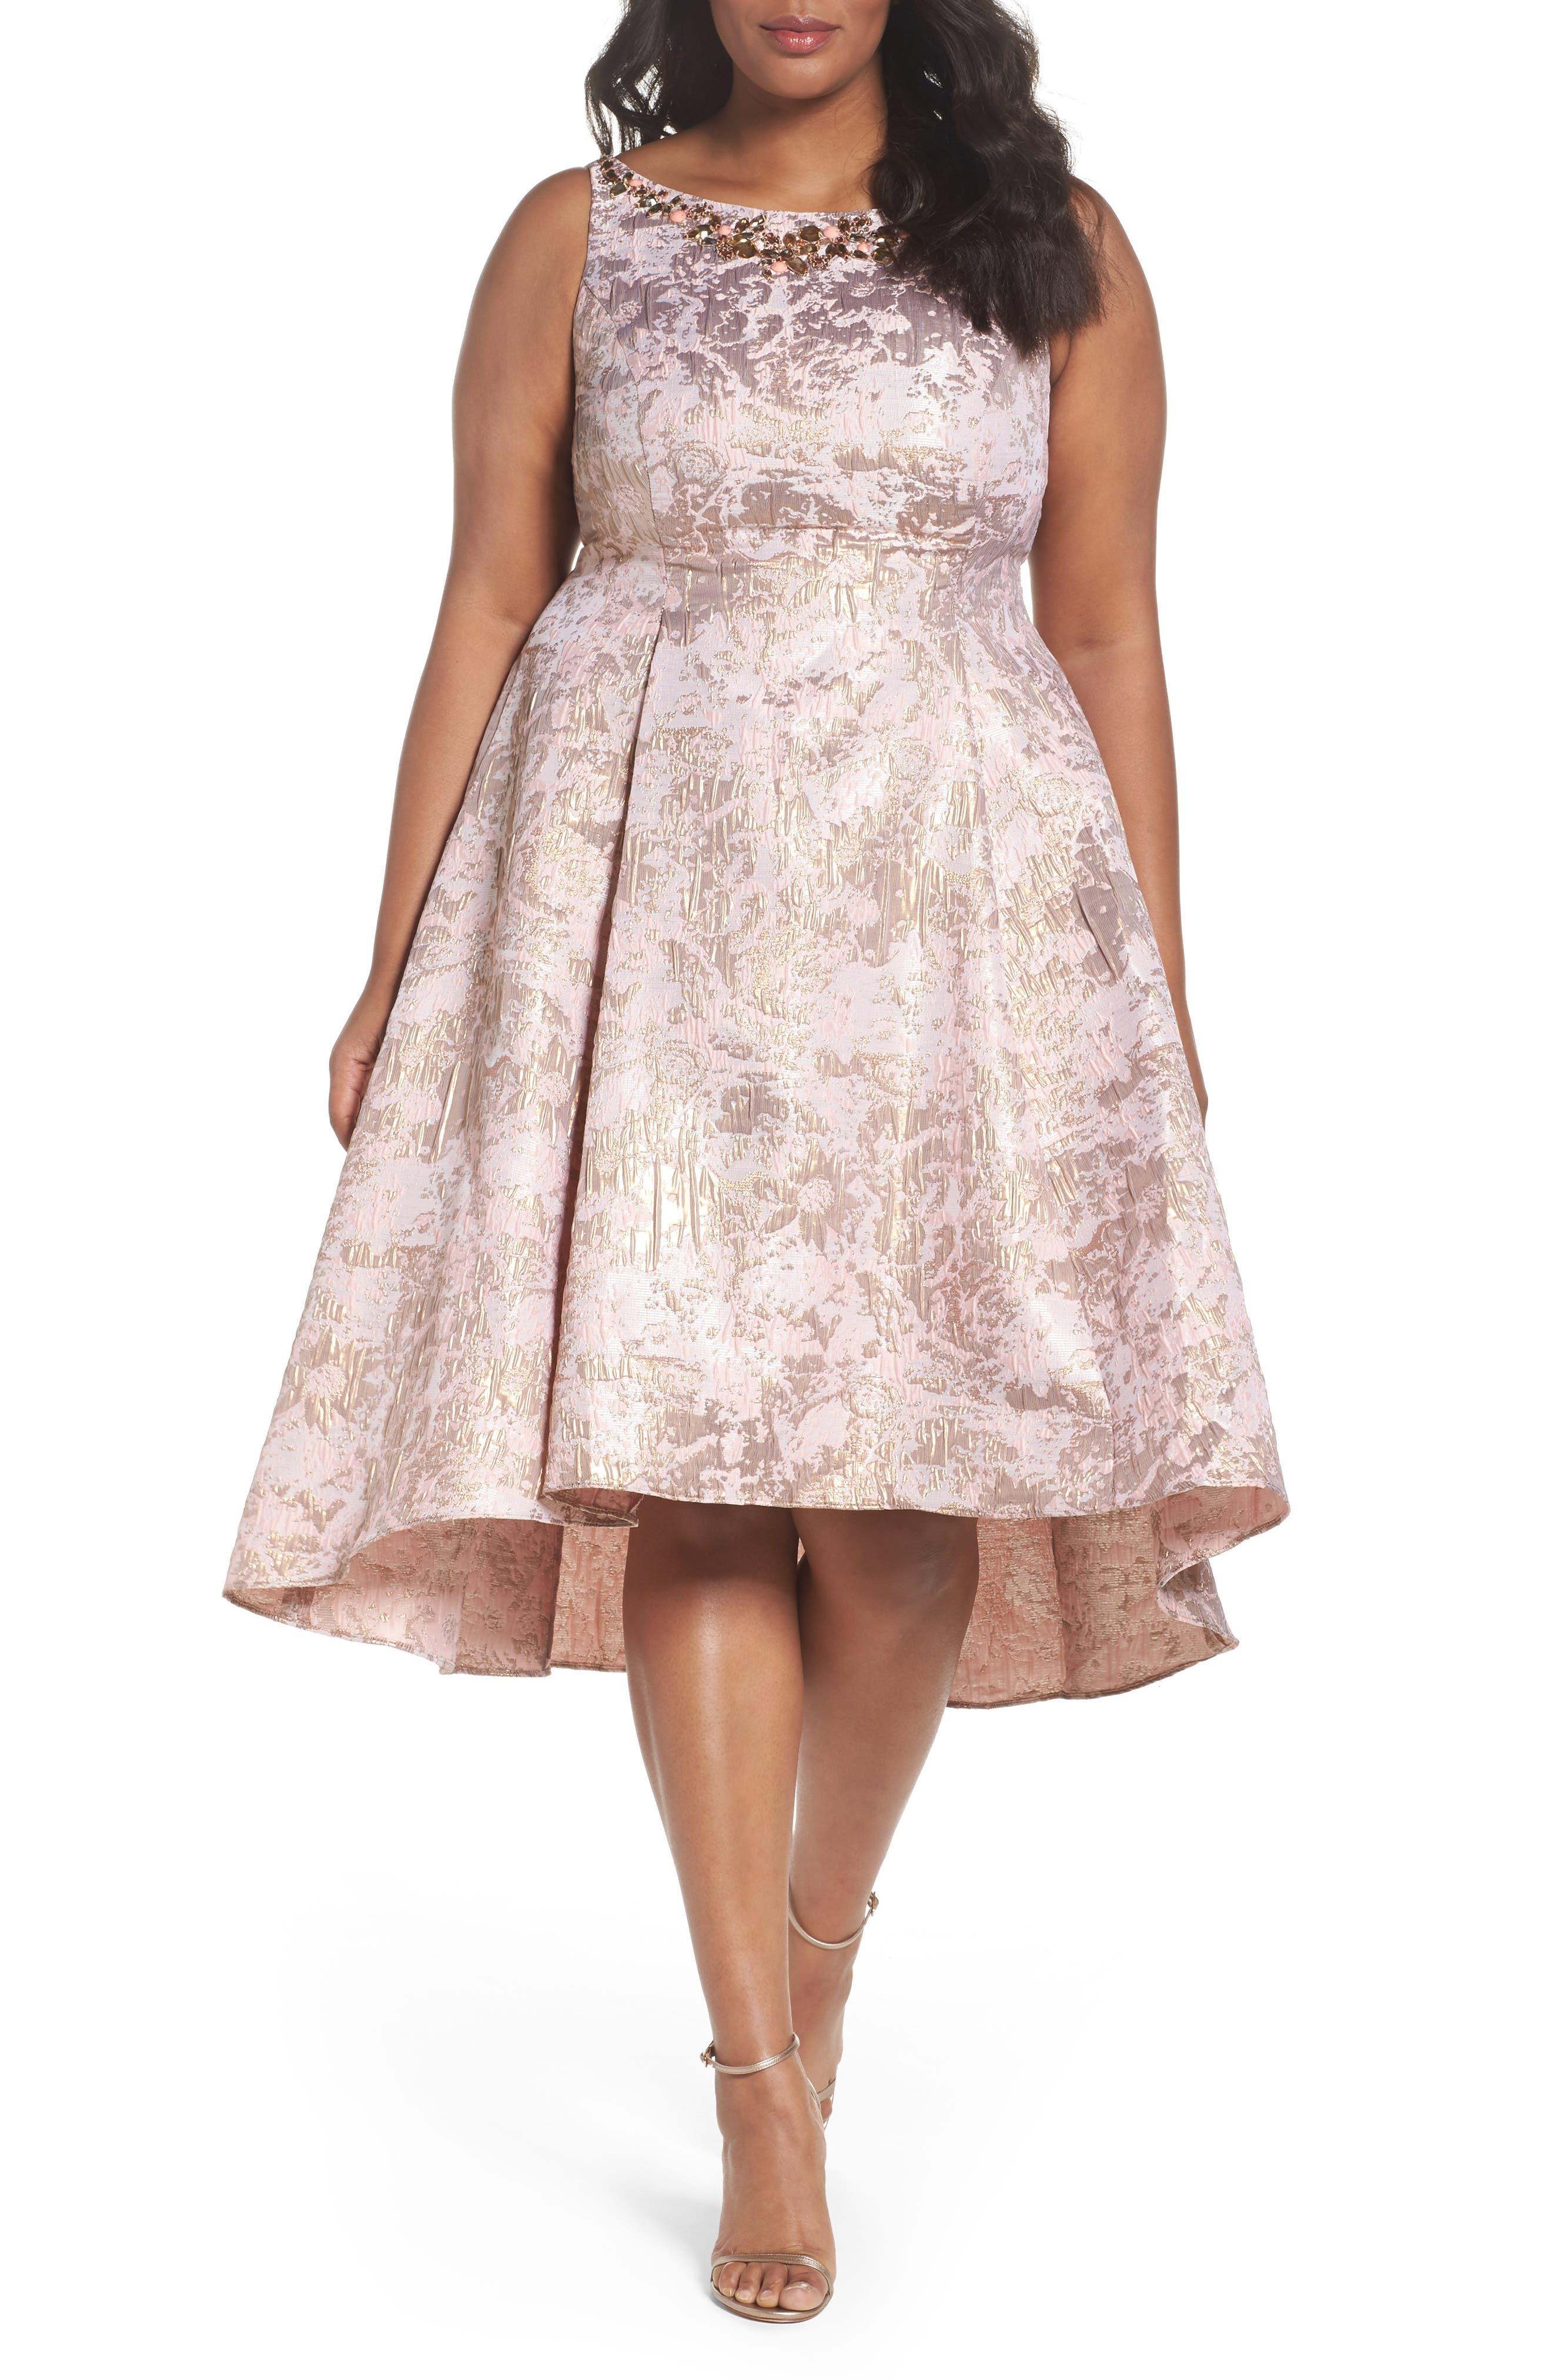 Adrianna Papell Embellished Metallic Jacquard Party Dress (Plus Size)